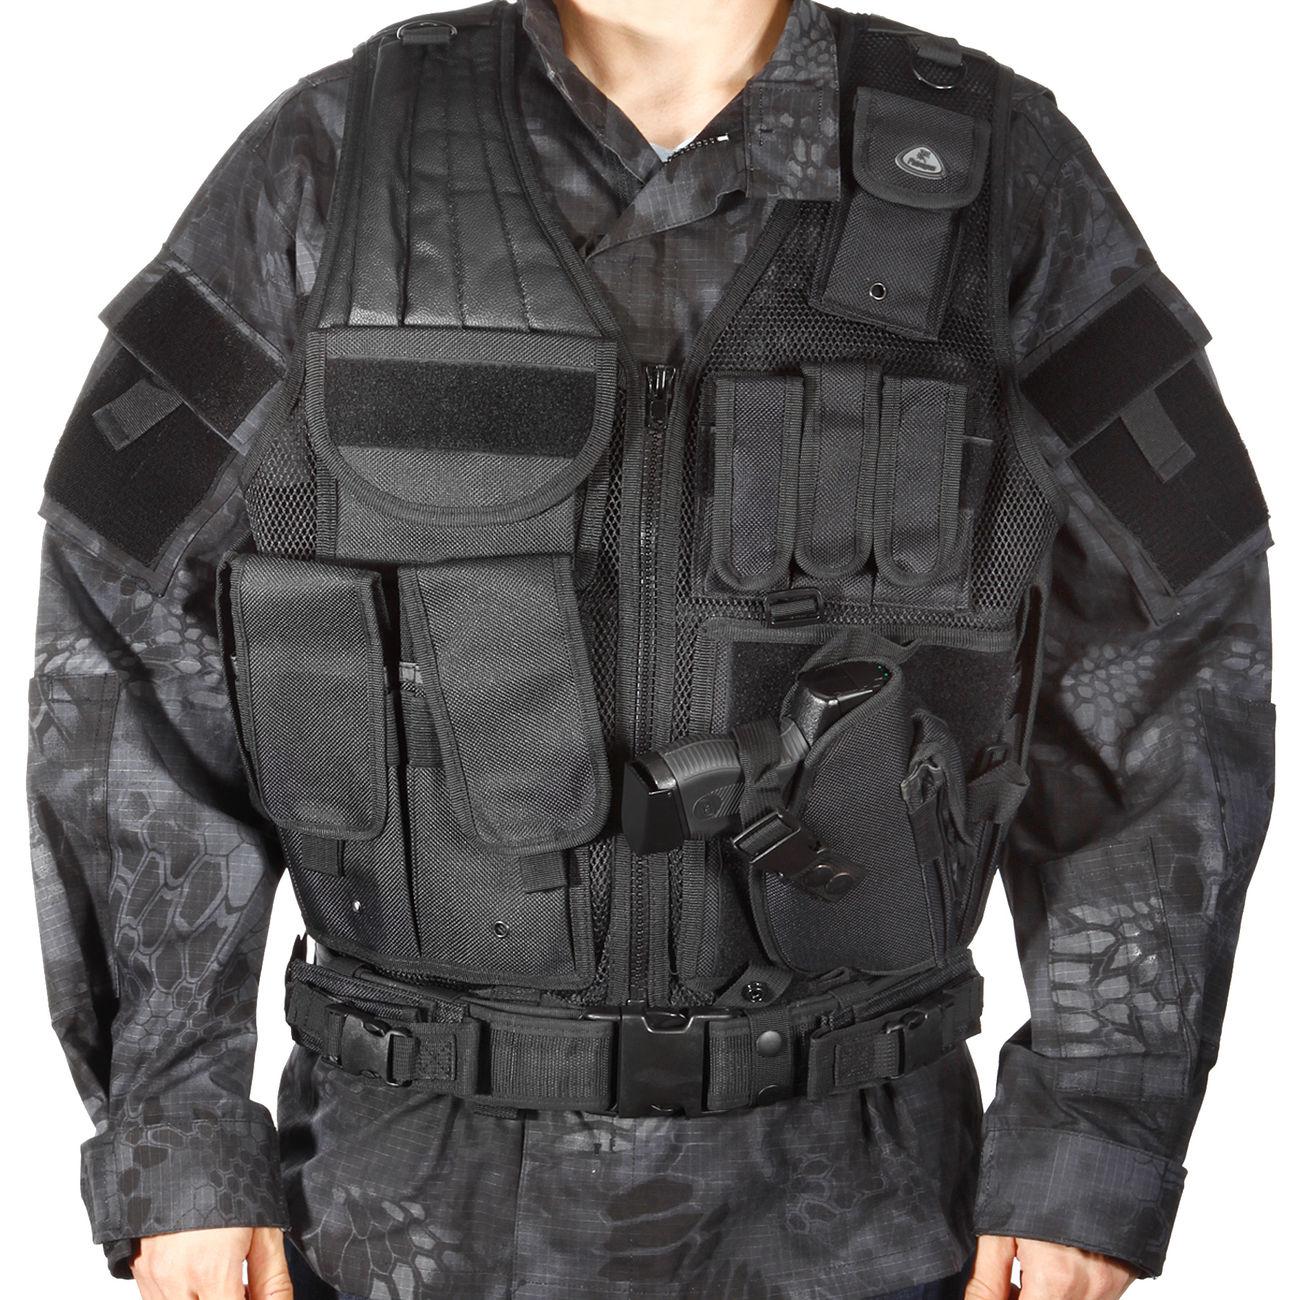 online store 74ea6 7c0c6 Fidragon Tactical Weste, Einsatzweste schwarz